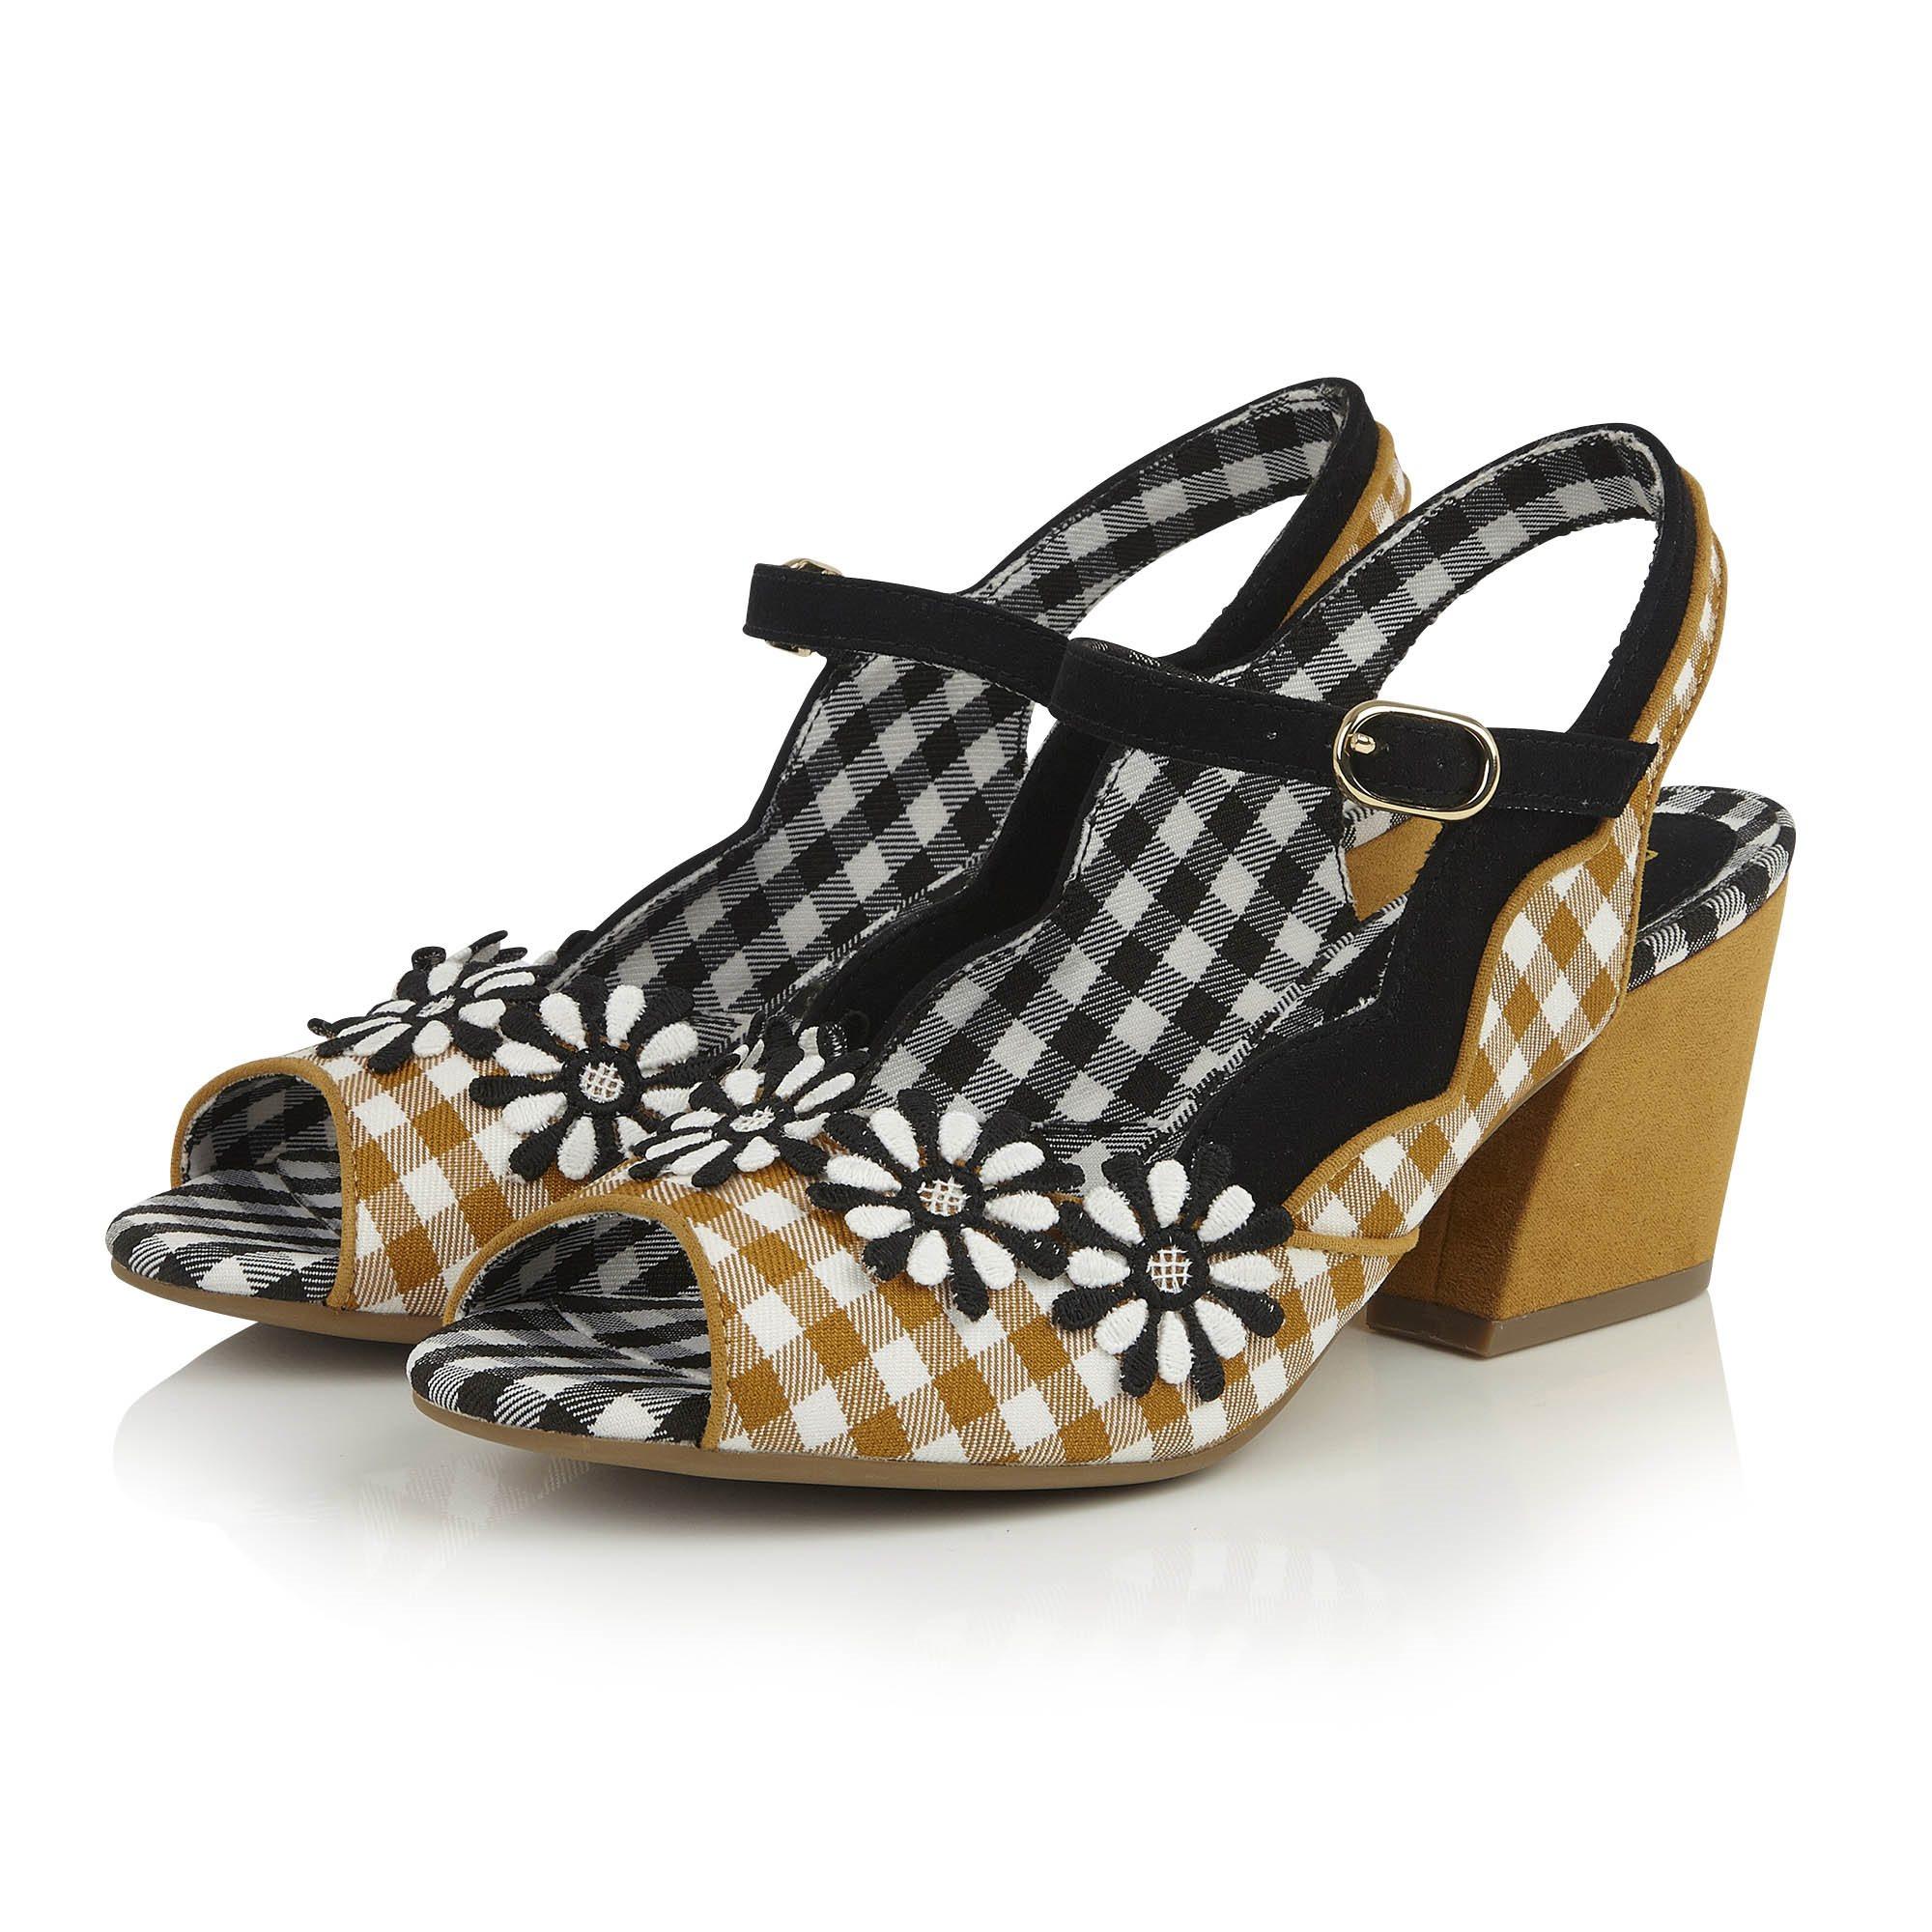 f5c651abad Ruby Shoo Hera Žlto-čierne kárované sandále - JoyStore.sk